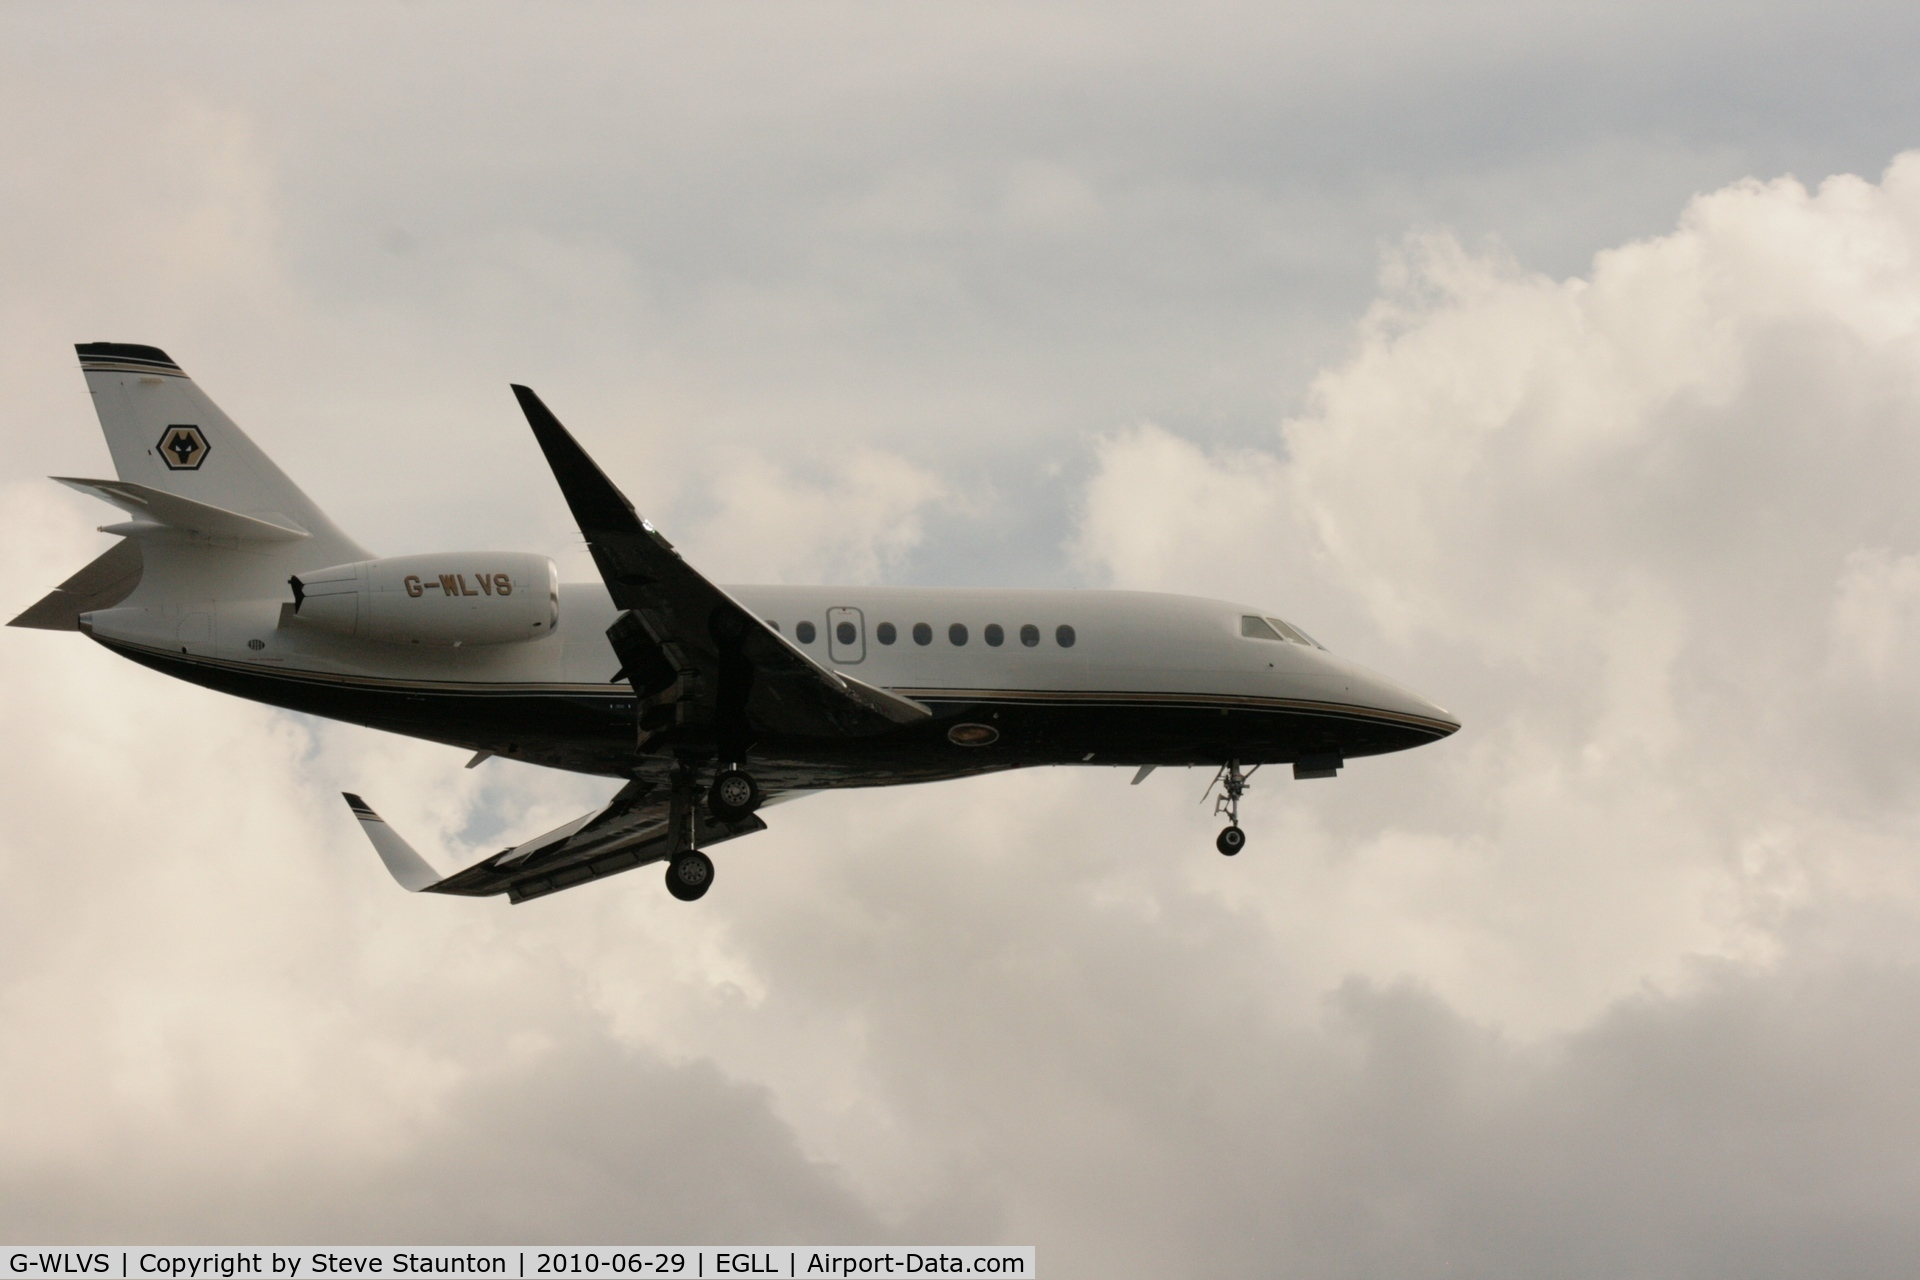 G-WLVS, 2007 Dassault Falcon 2000EX C/N 141, Taken at Heathrow Airport, June 2010